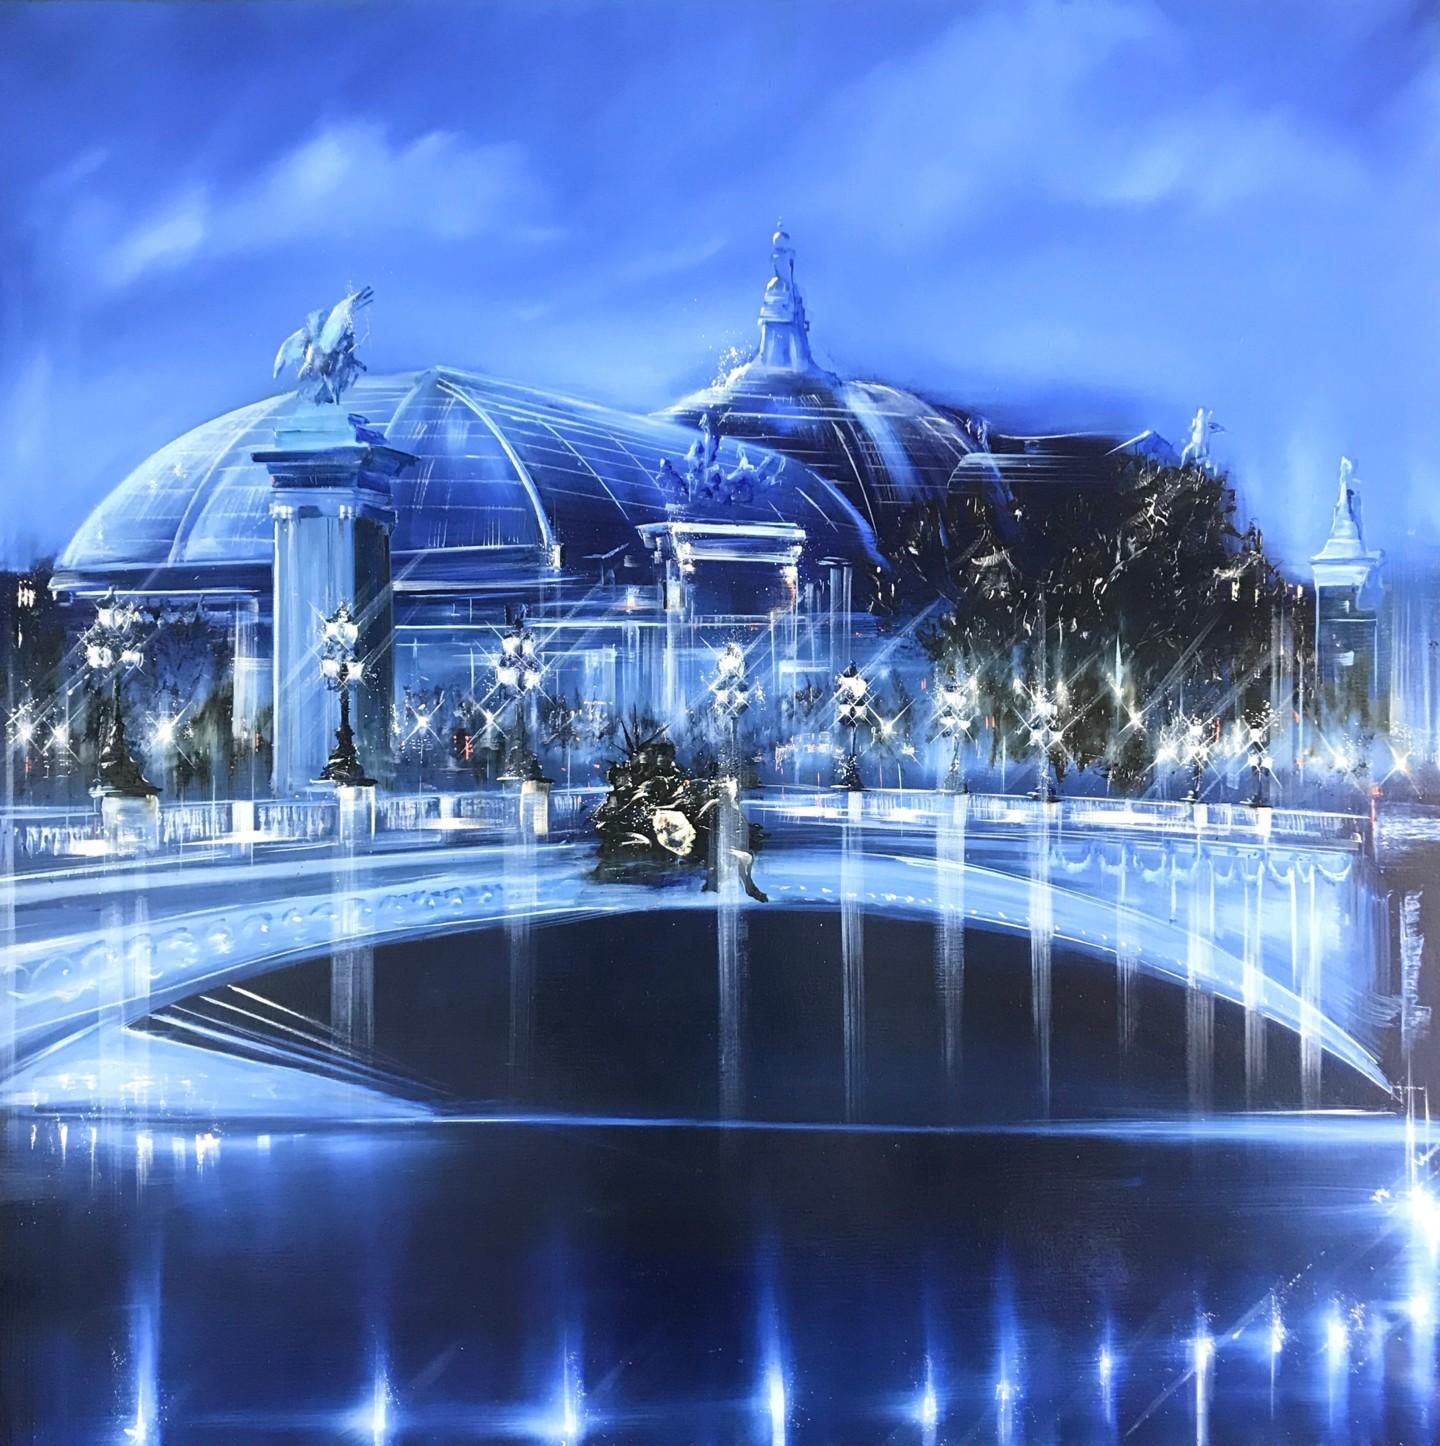 Jerome Guillet - Grand Palais